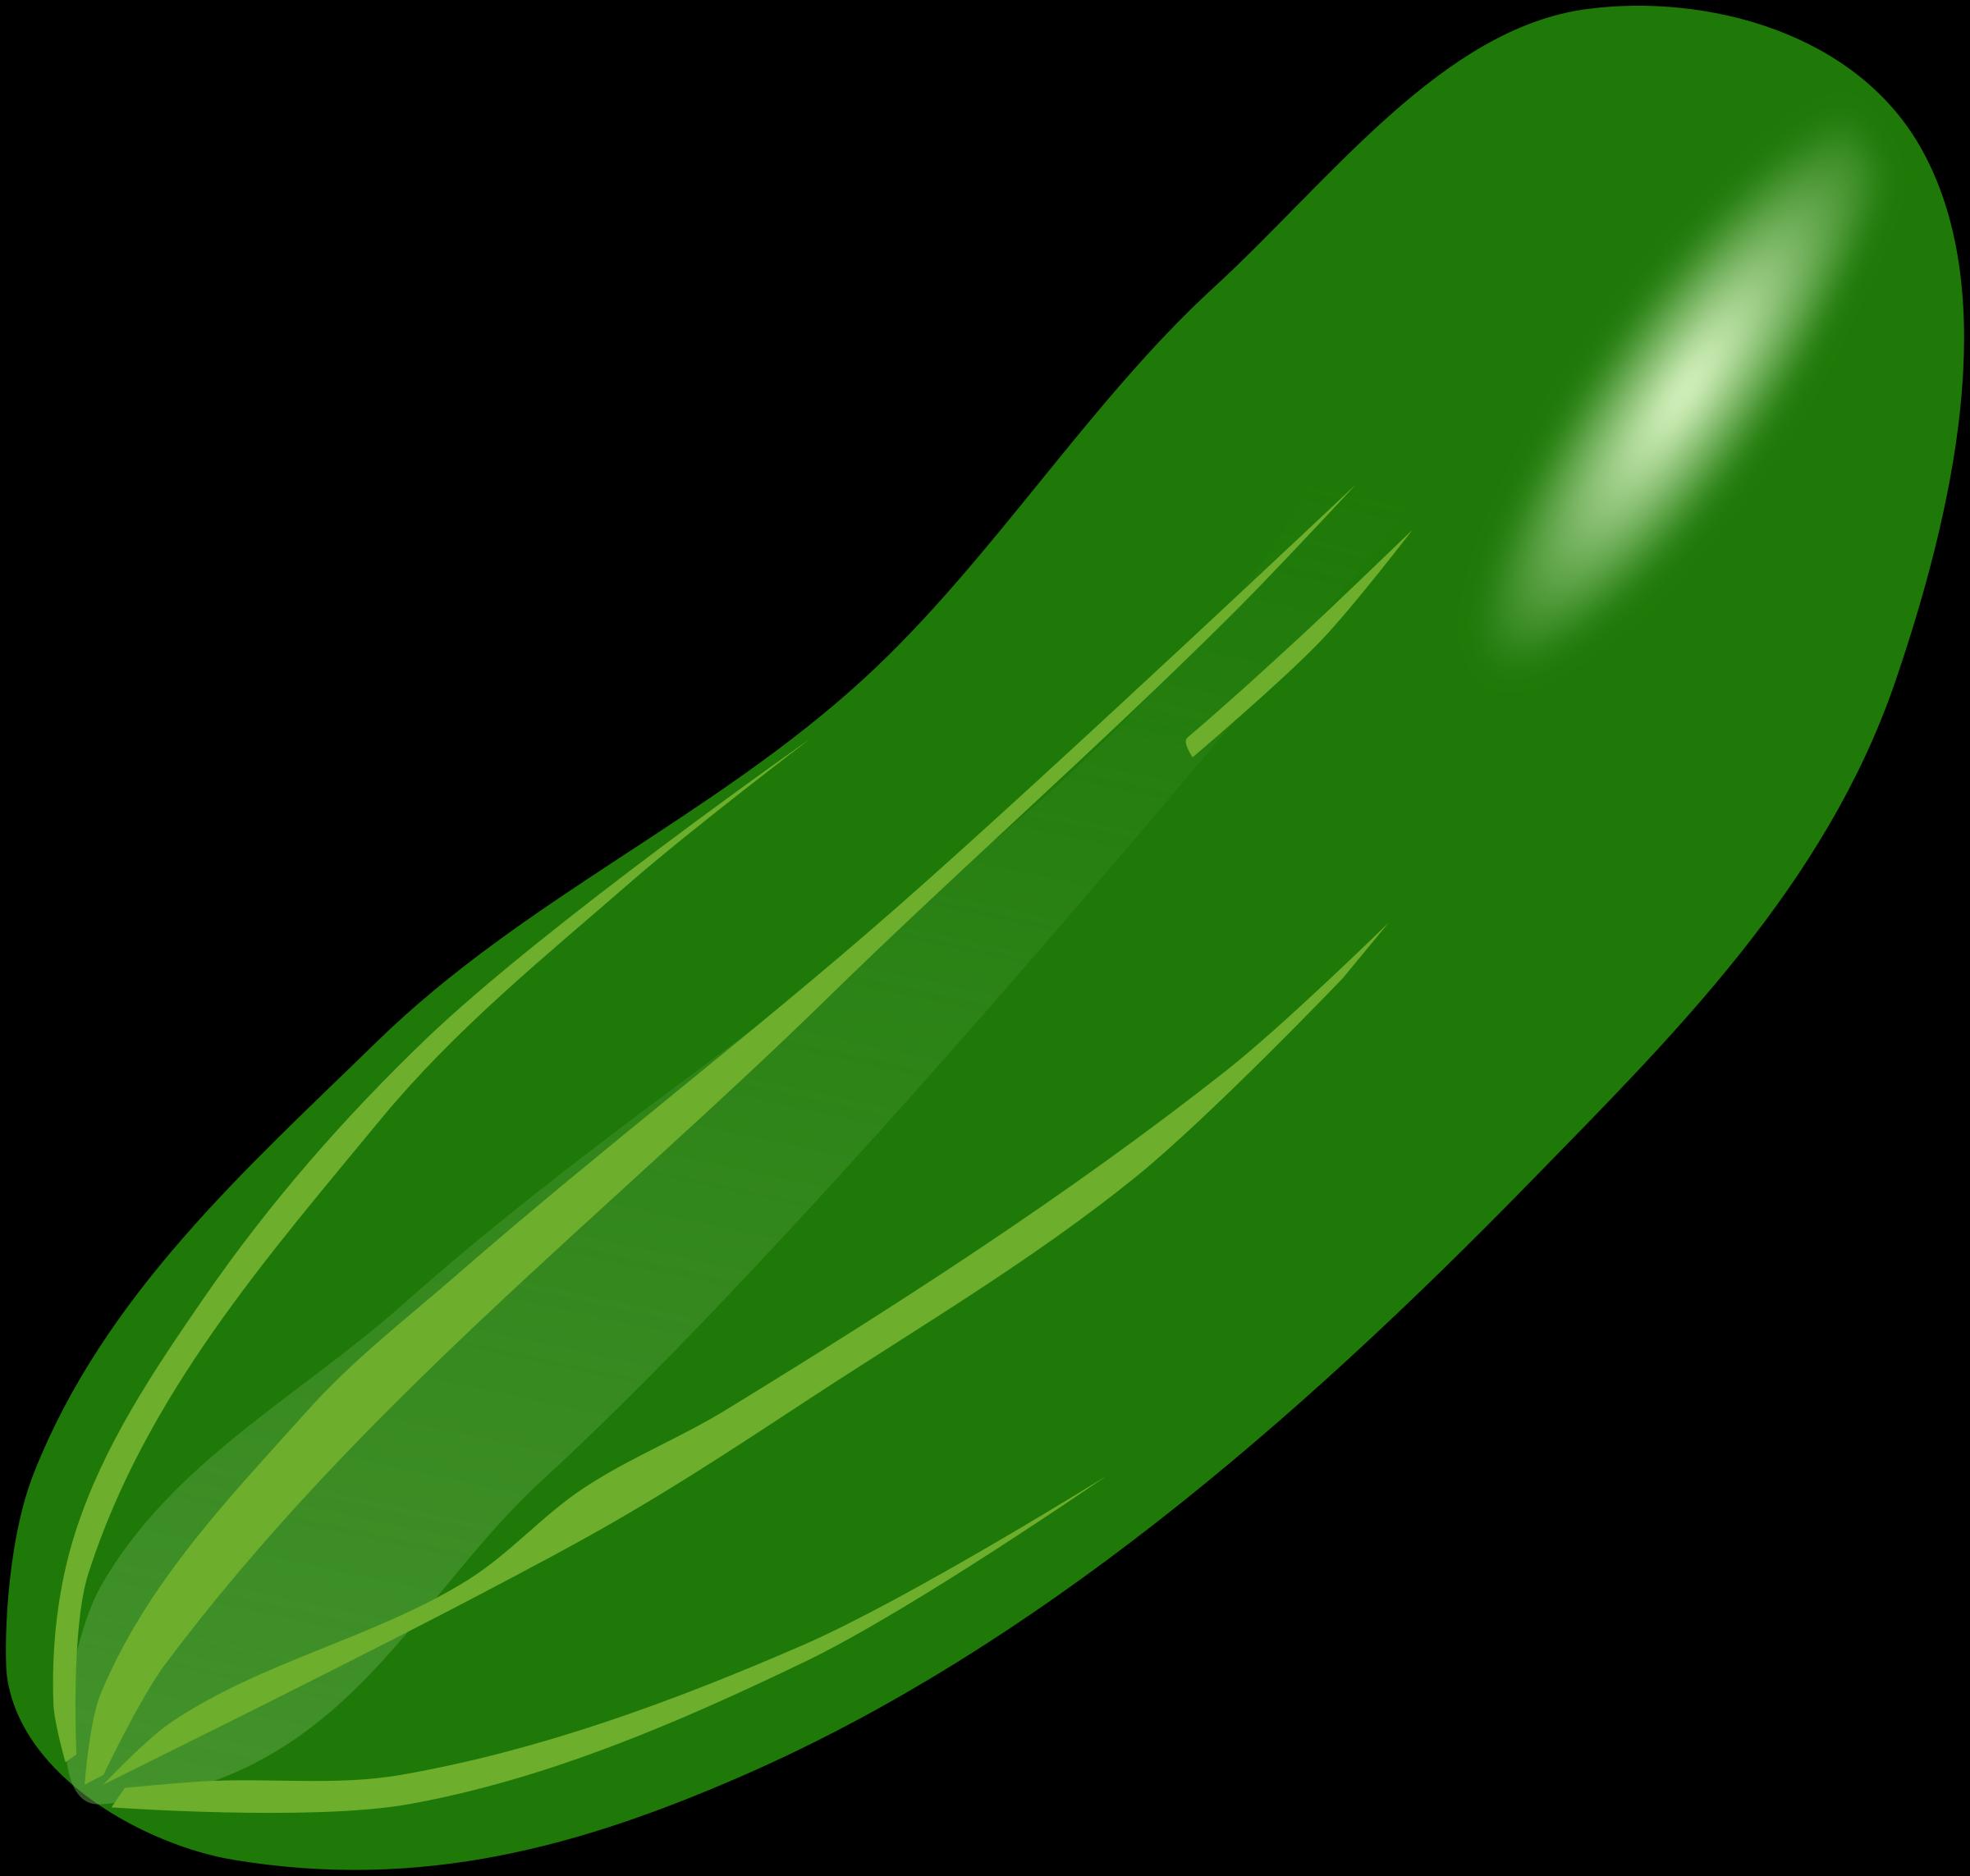 Cucumber clipart cucumberclipart vegetable clip art 2 image